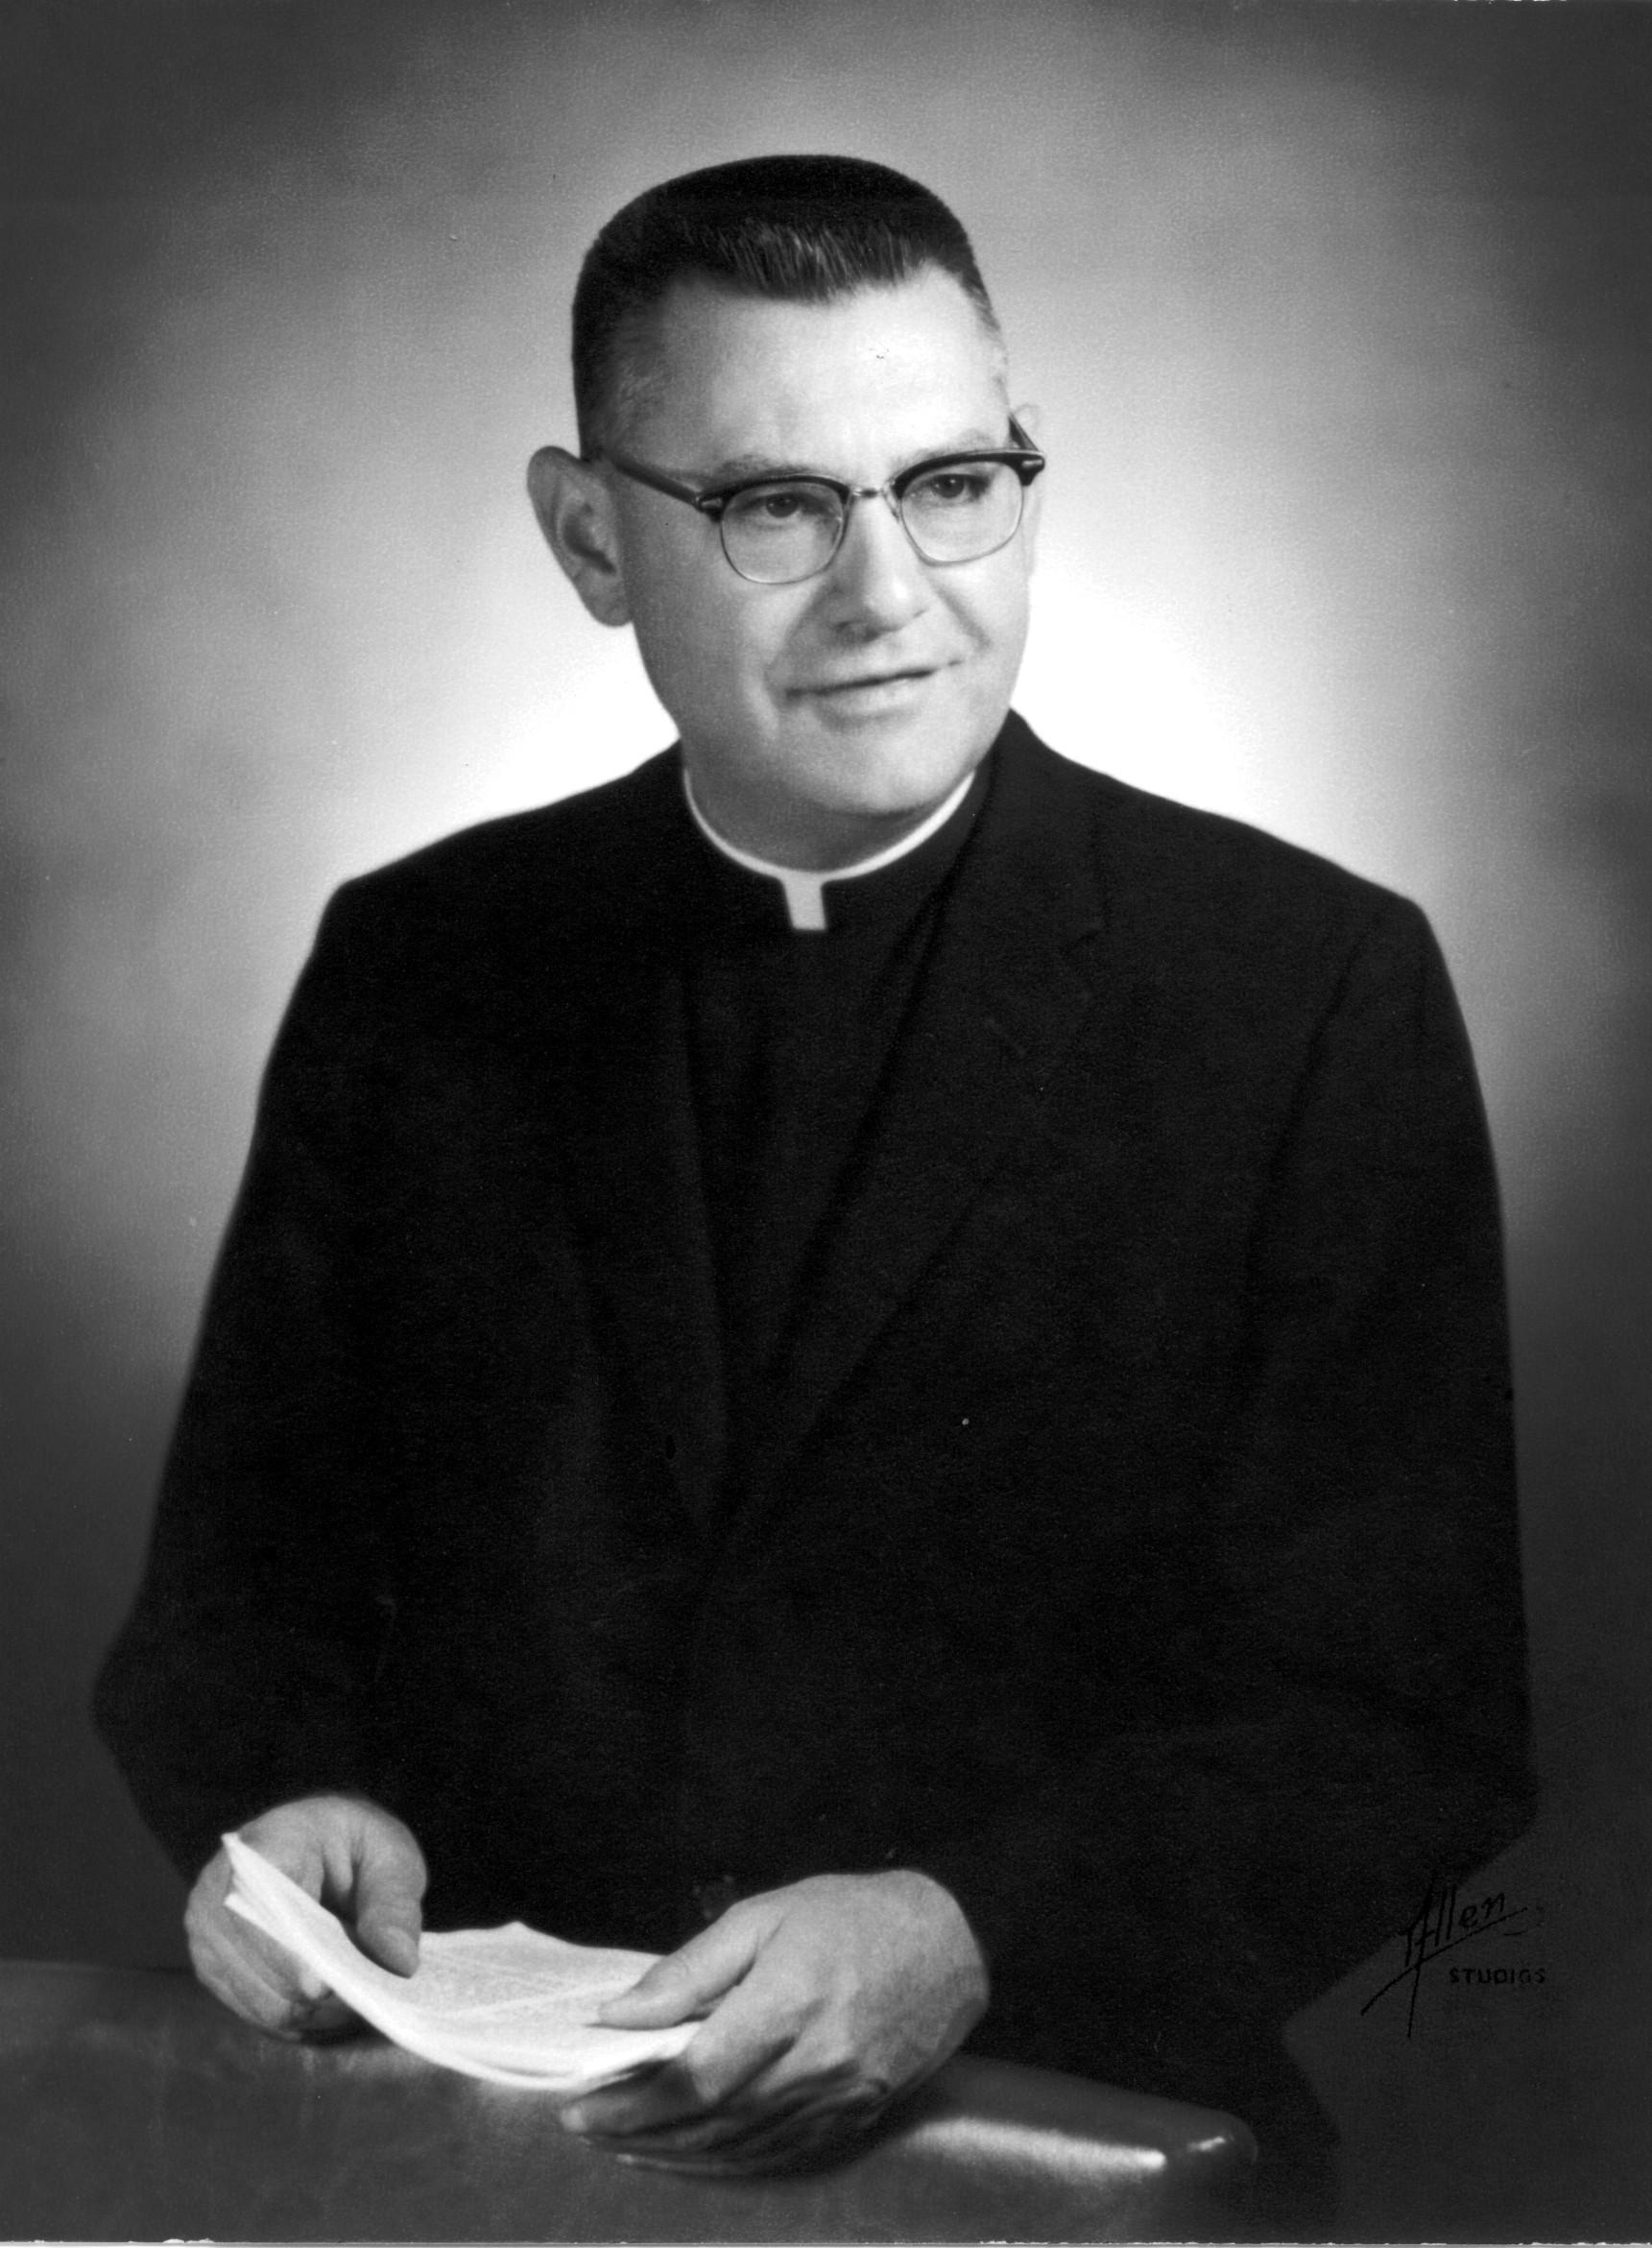 Reverend Monsignor John J. Daum